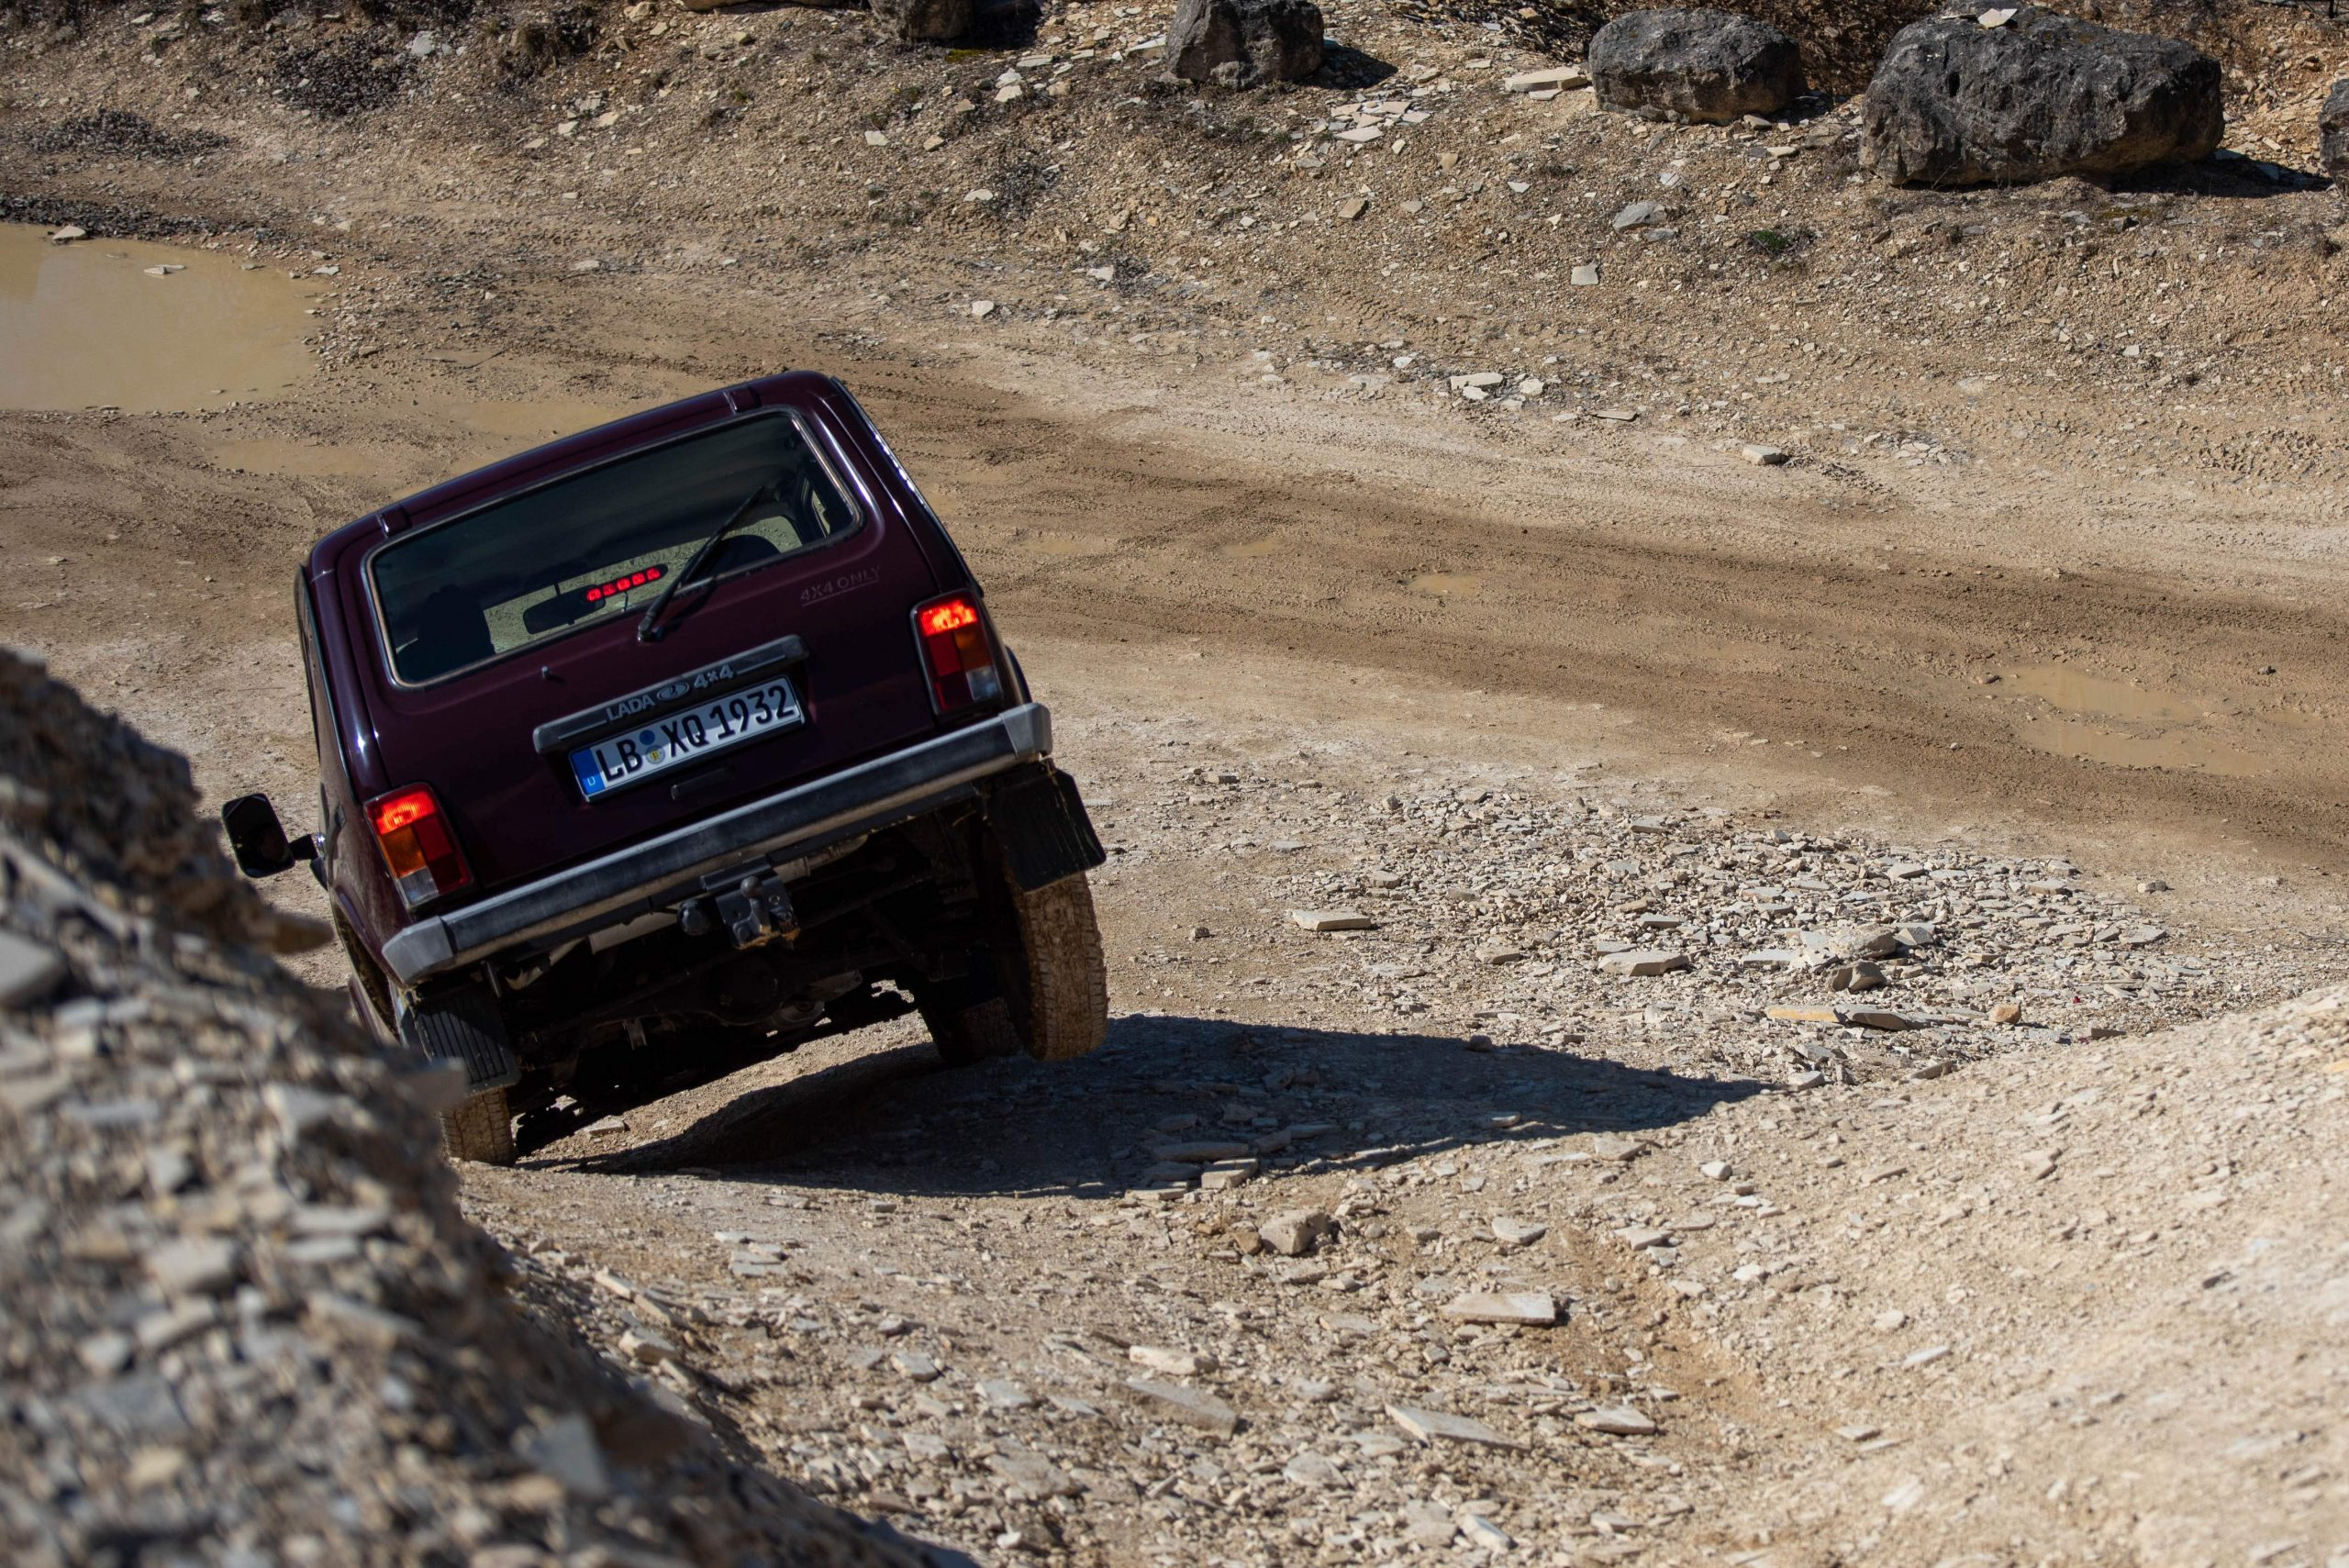 lada niva 4x4 off-road downhill quarry